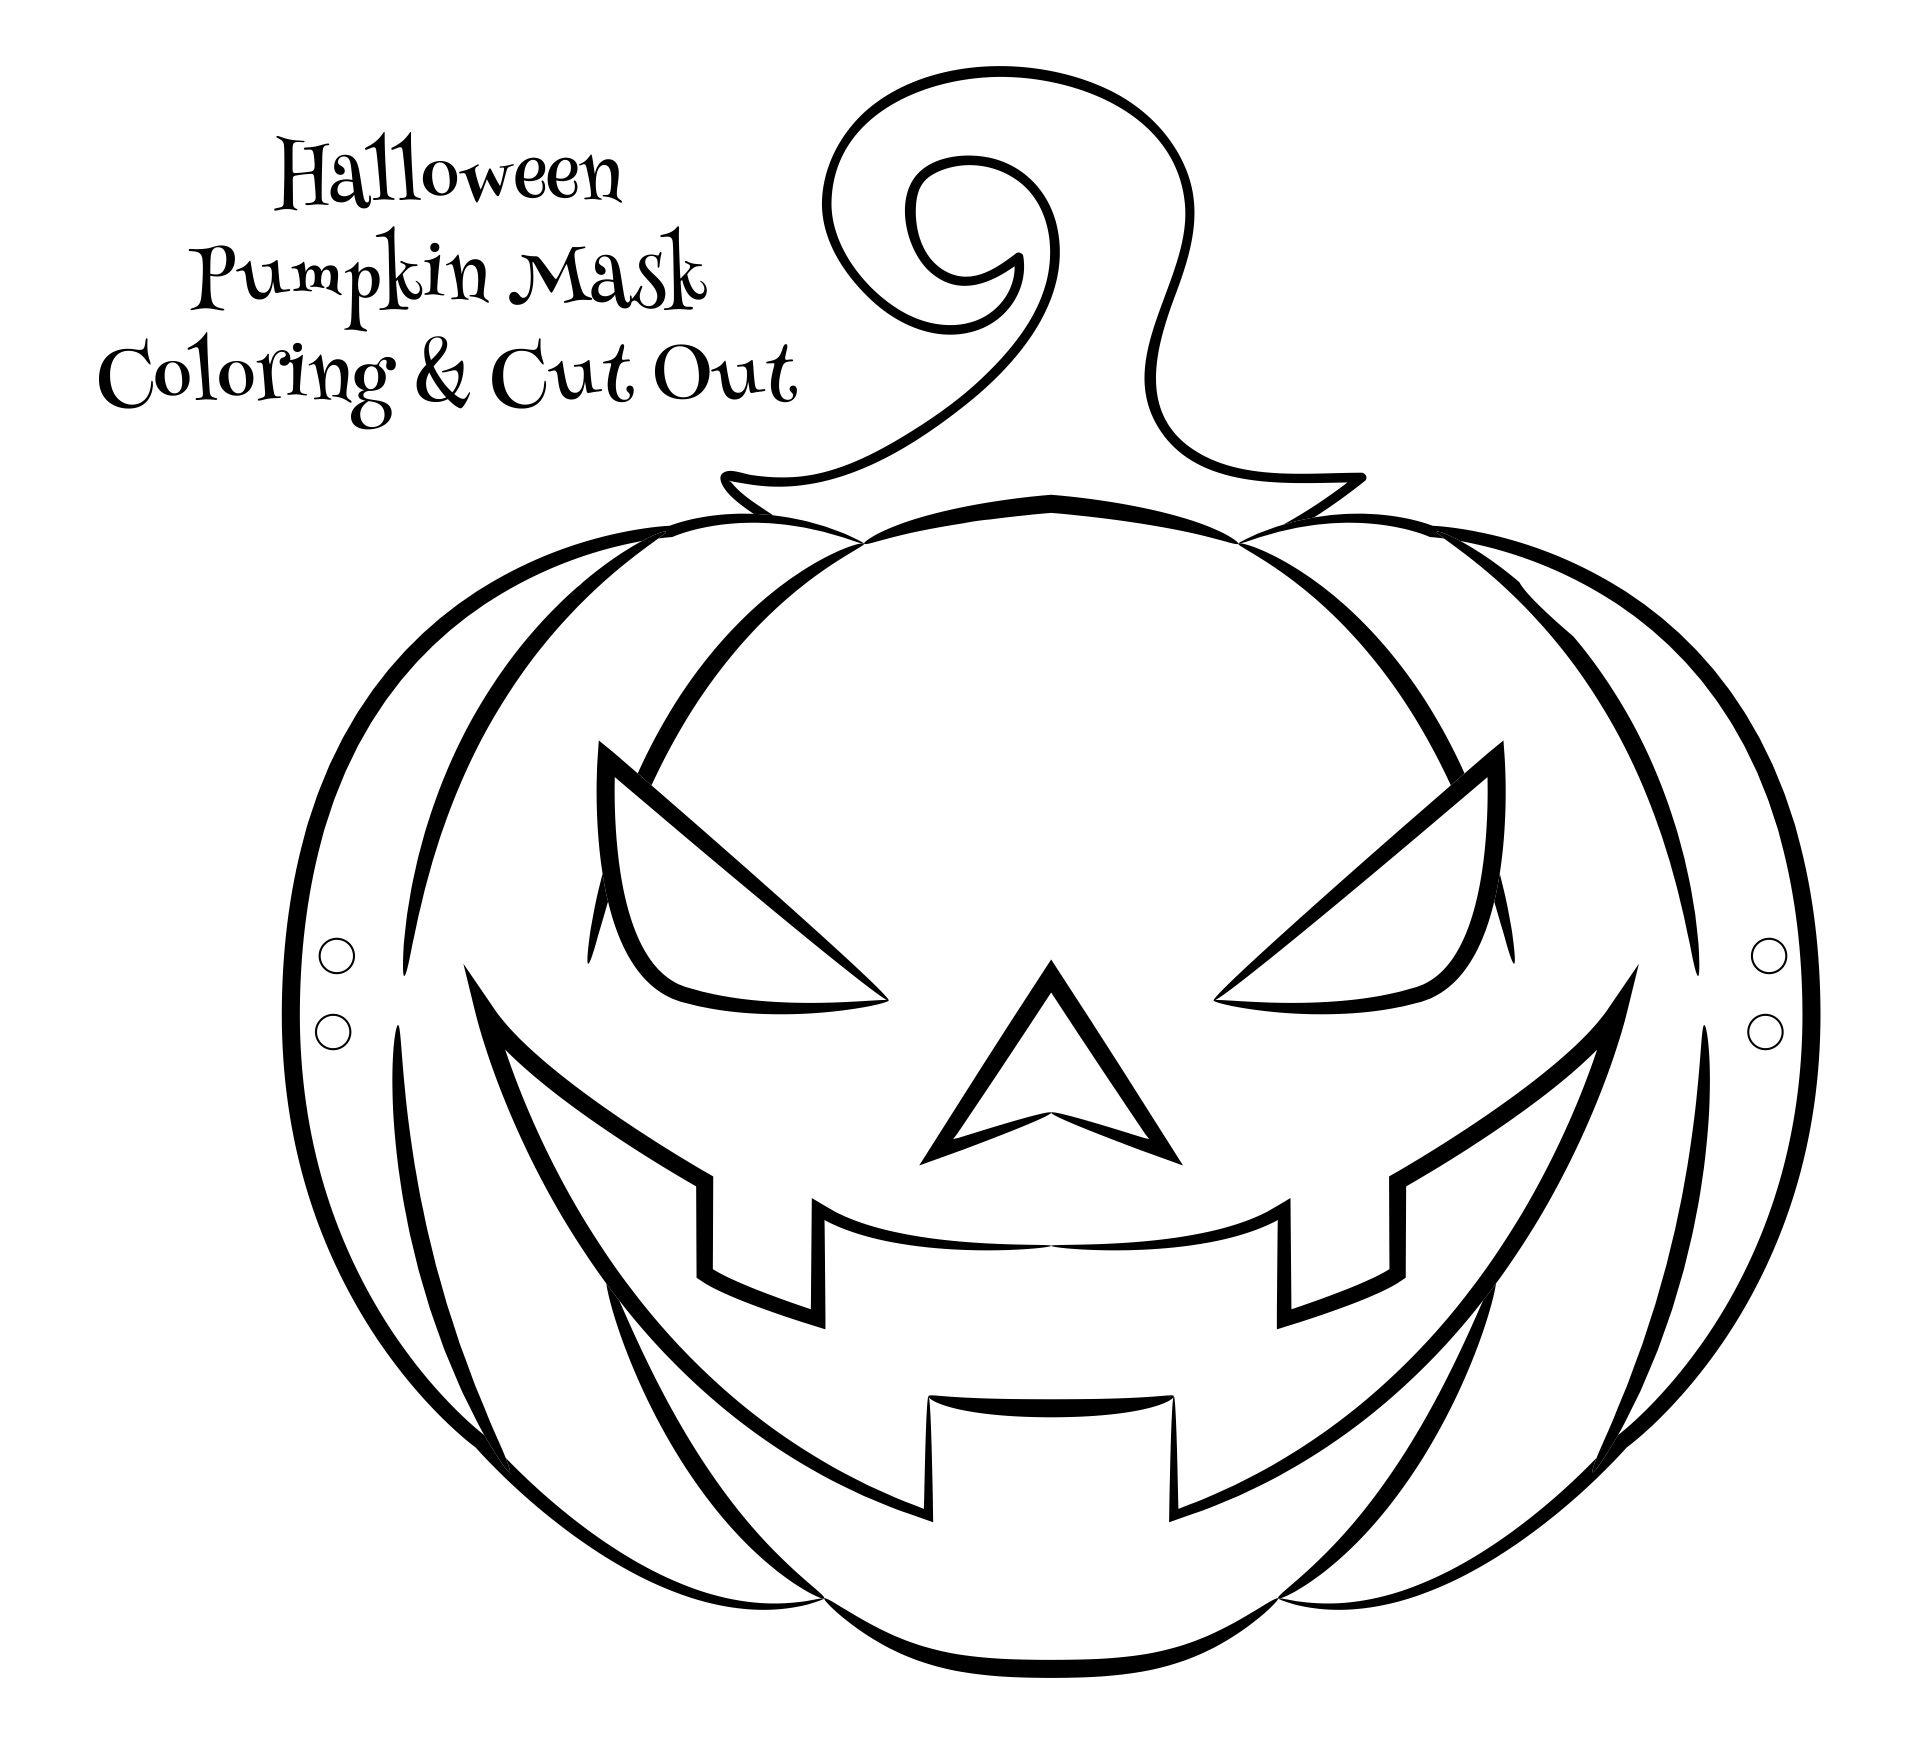 Kindergarten Crafts Halloween Printable Masks